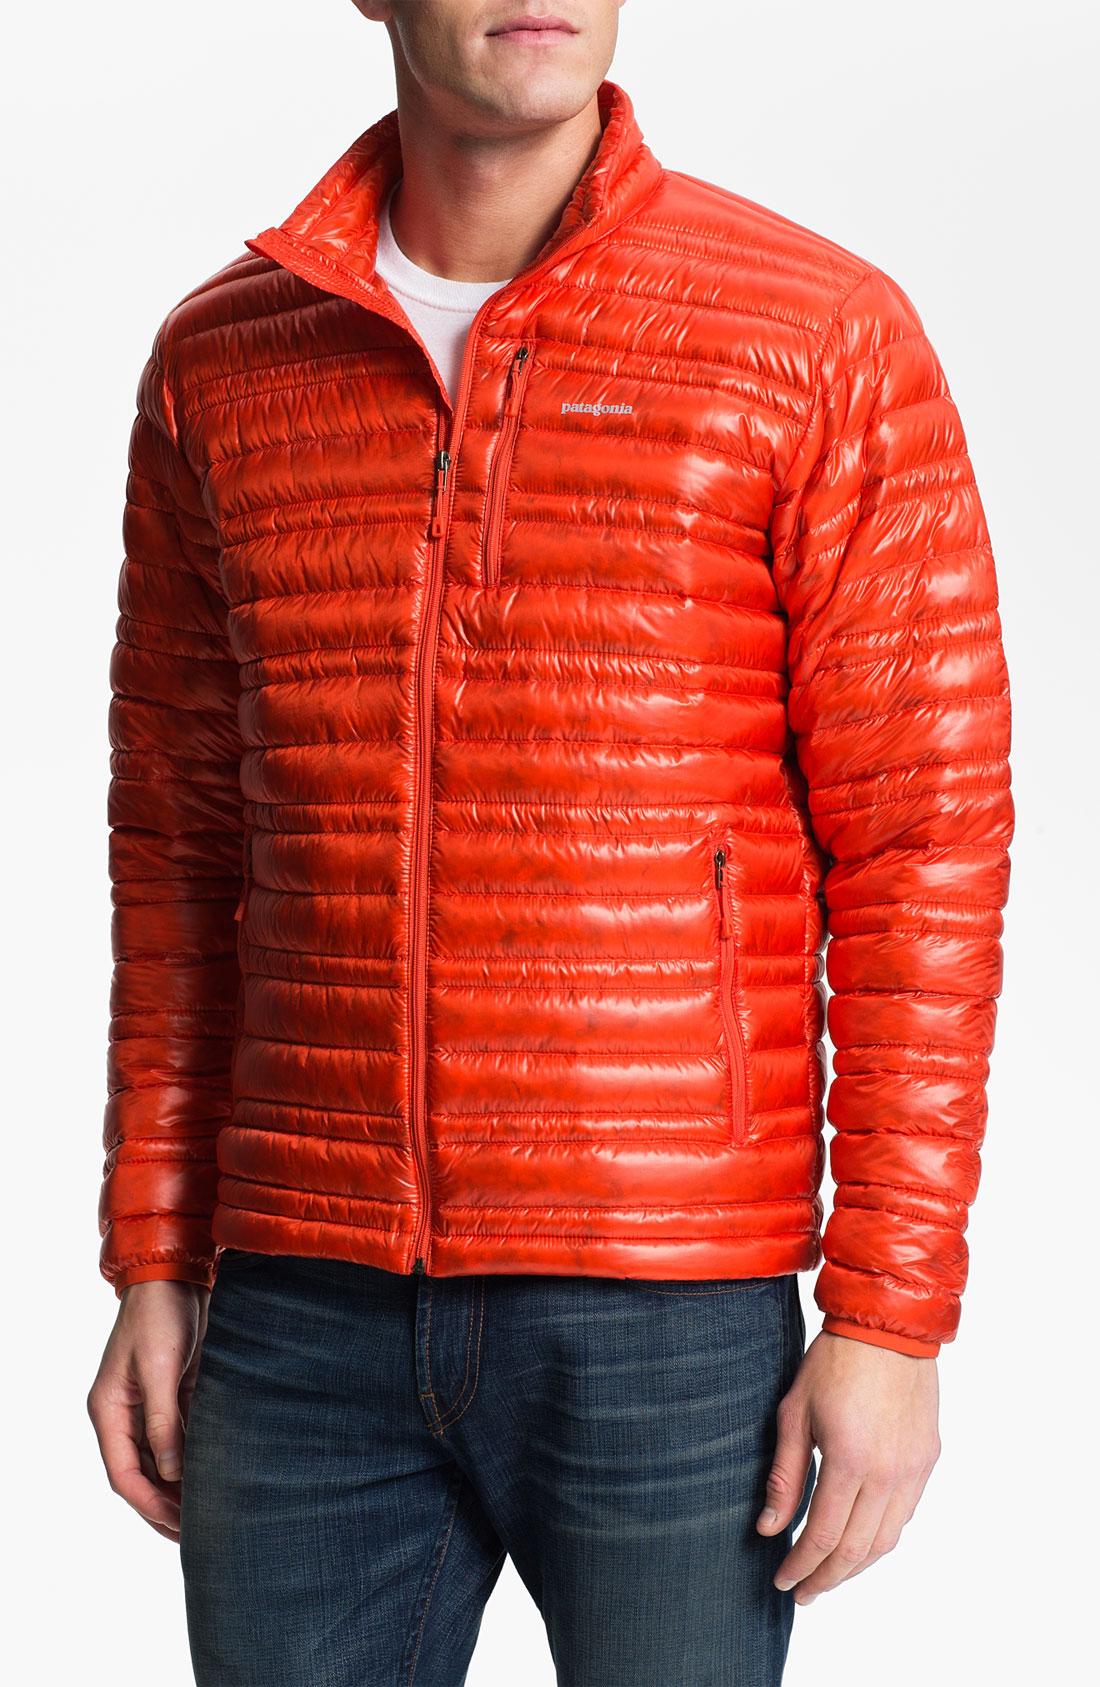 Patagonia Ultra Light Down Jacket In Orange For Men